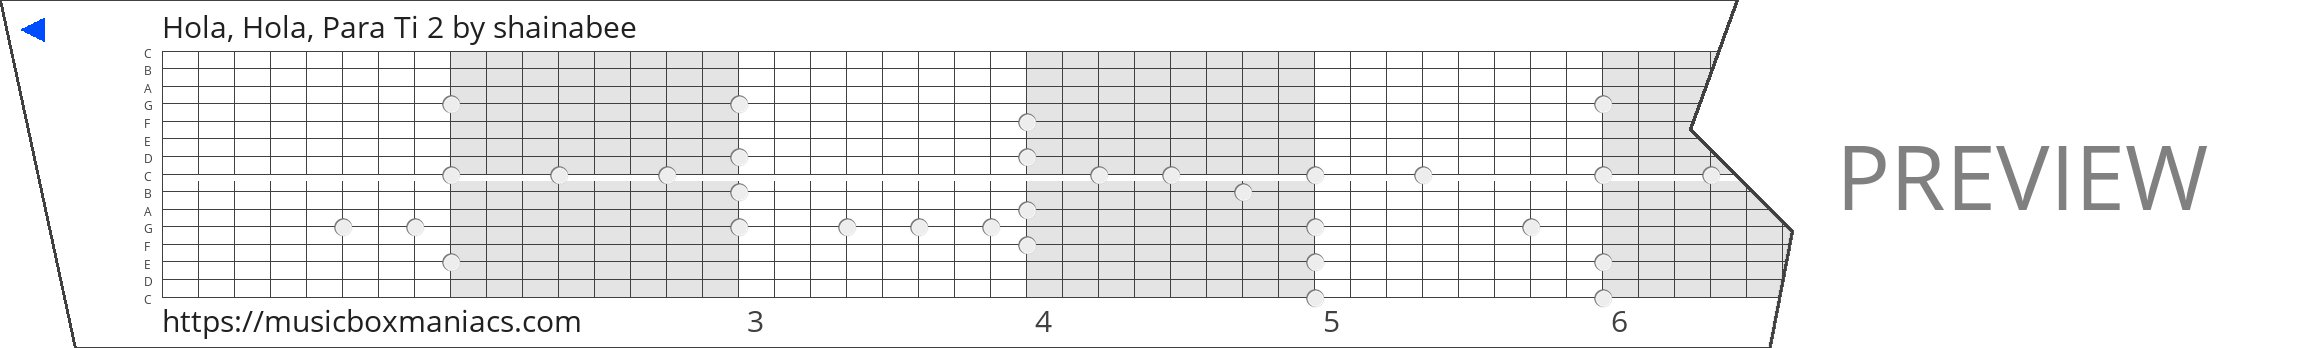 Hola, Hola, Para Ti 2 15 note music box paper strip